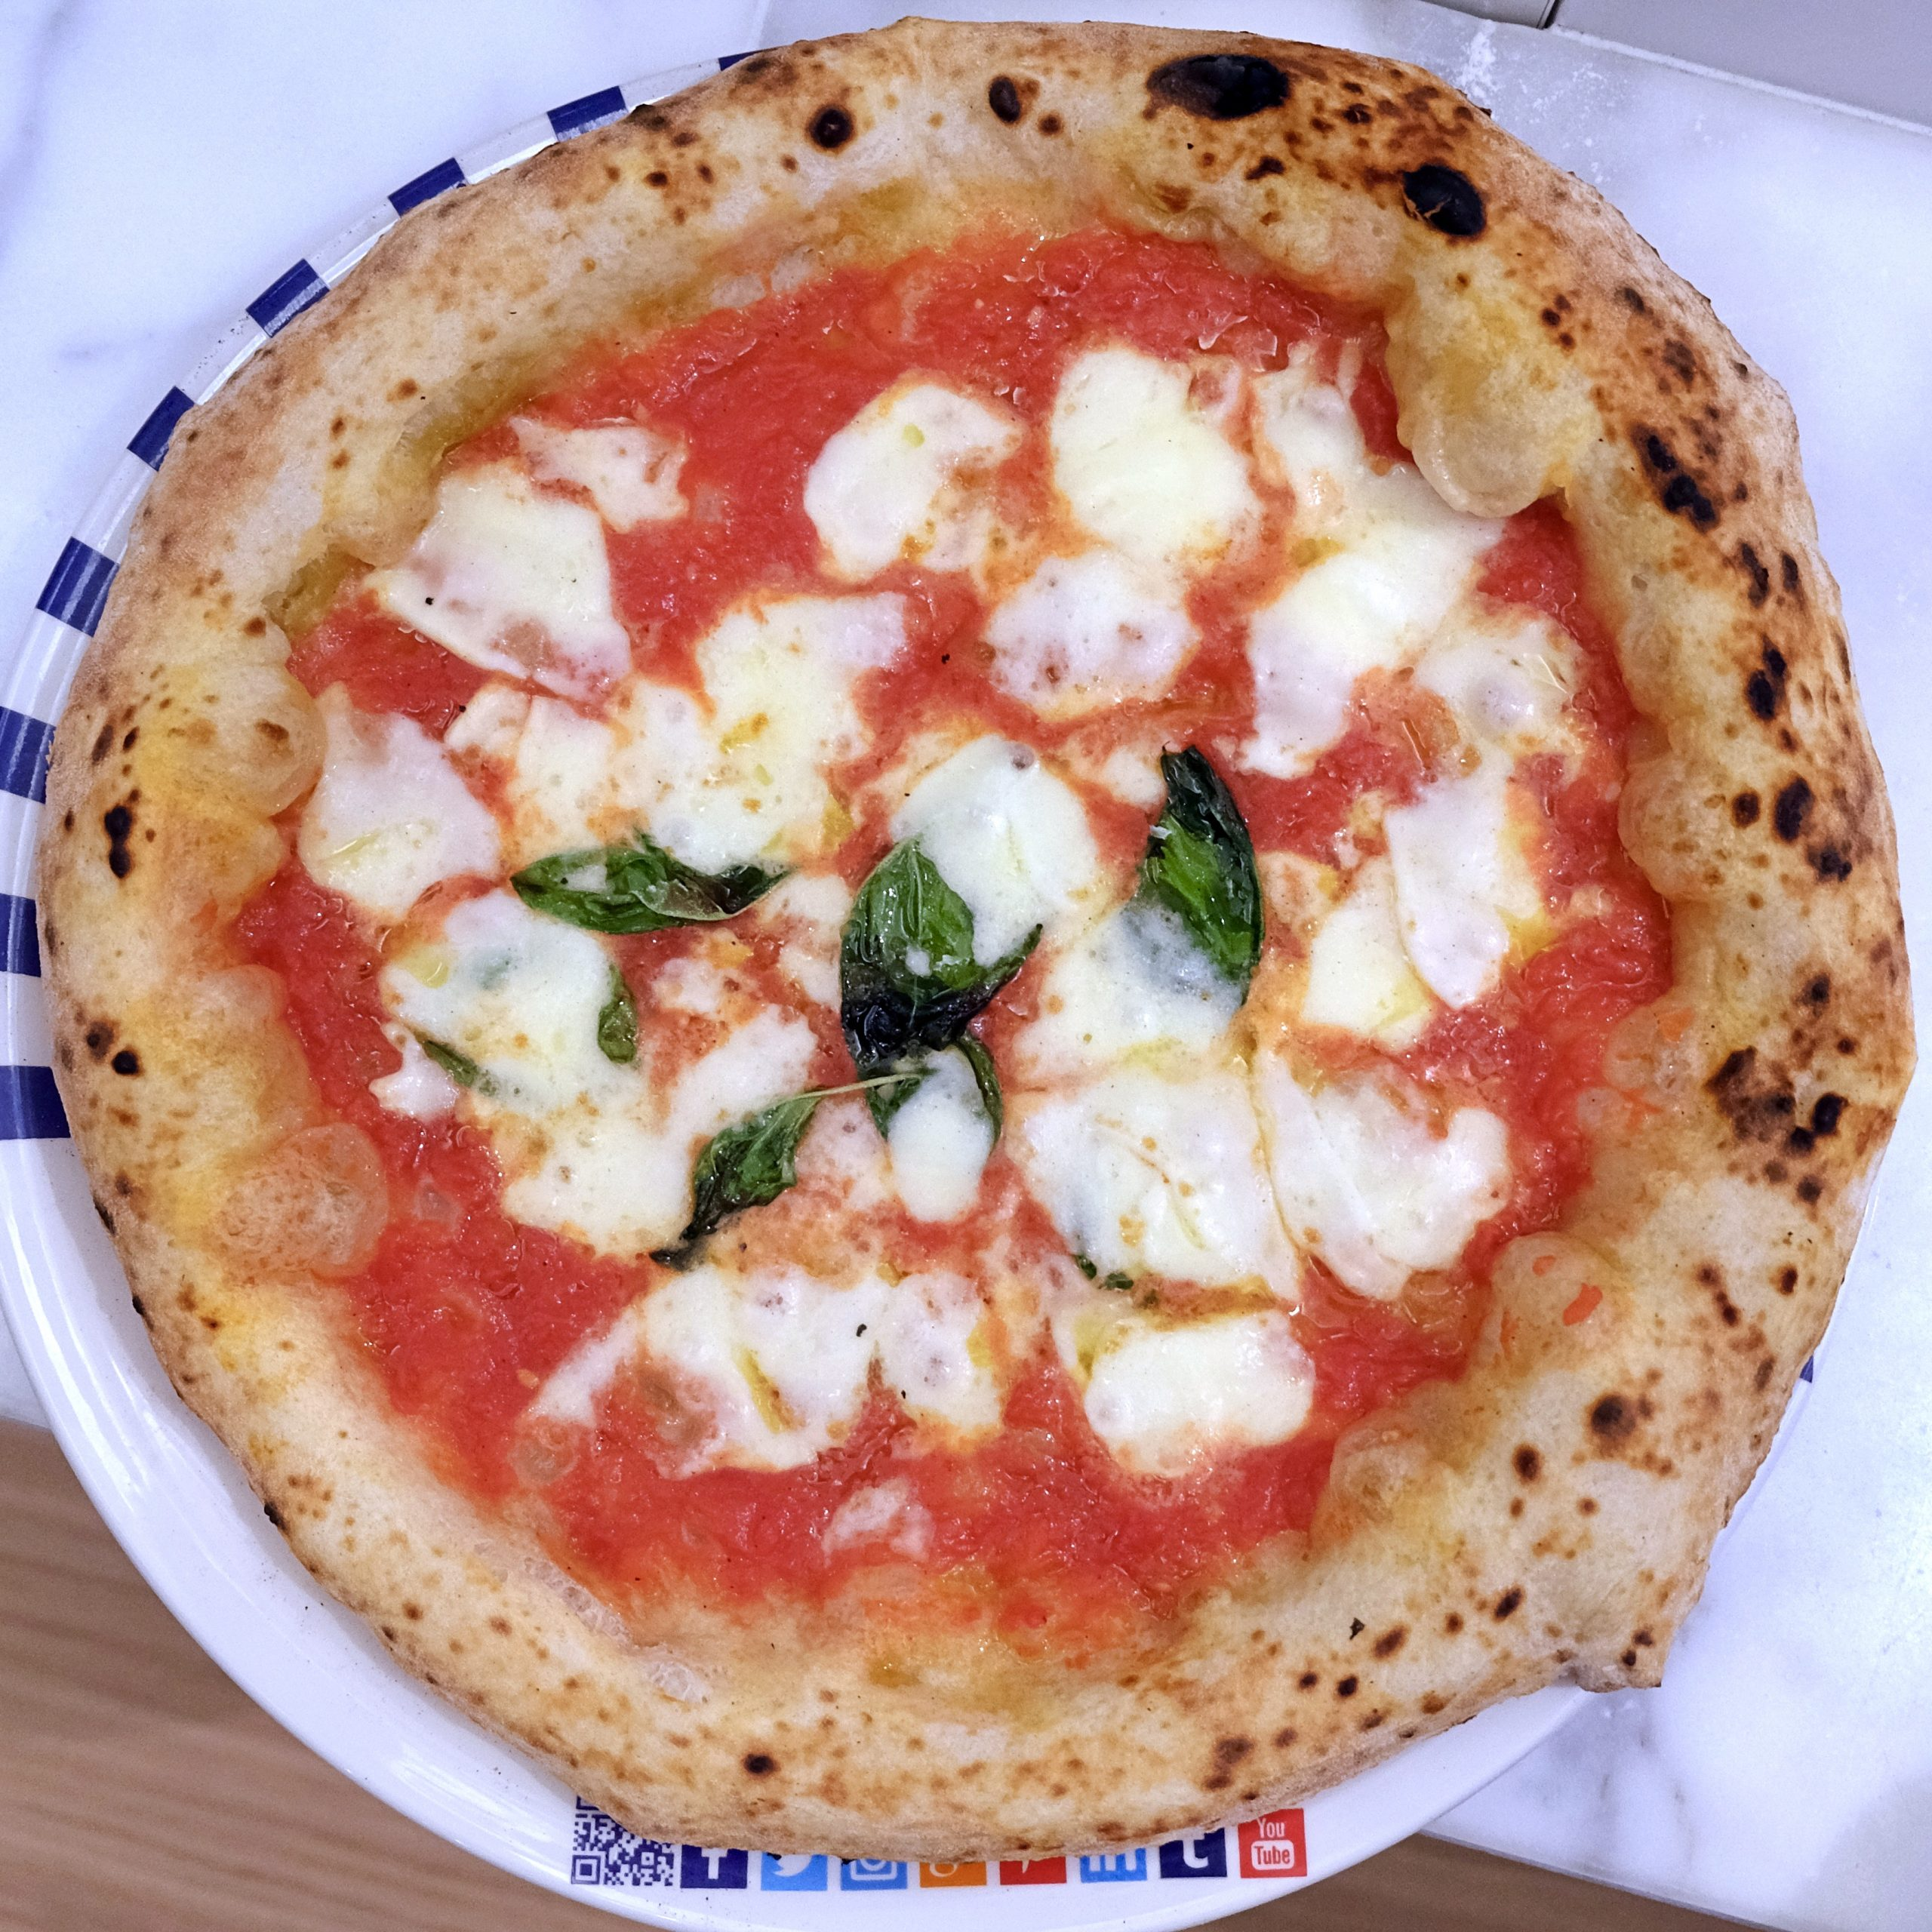 Margherita (Gino Sorbillo Pizza Gourmand Roma)